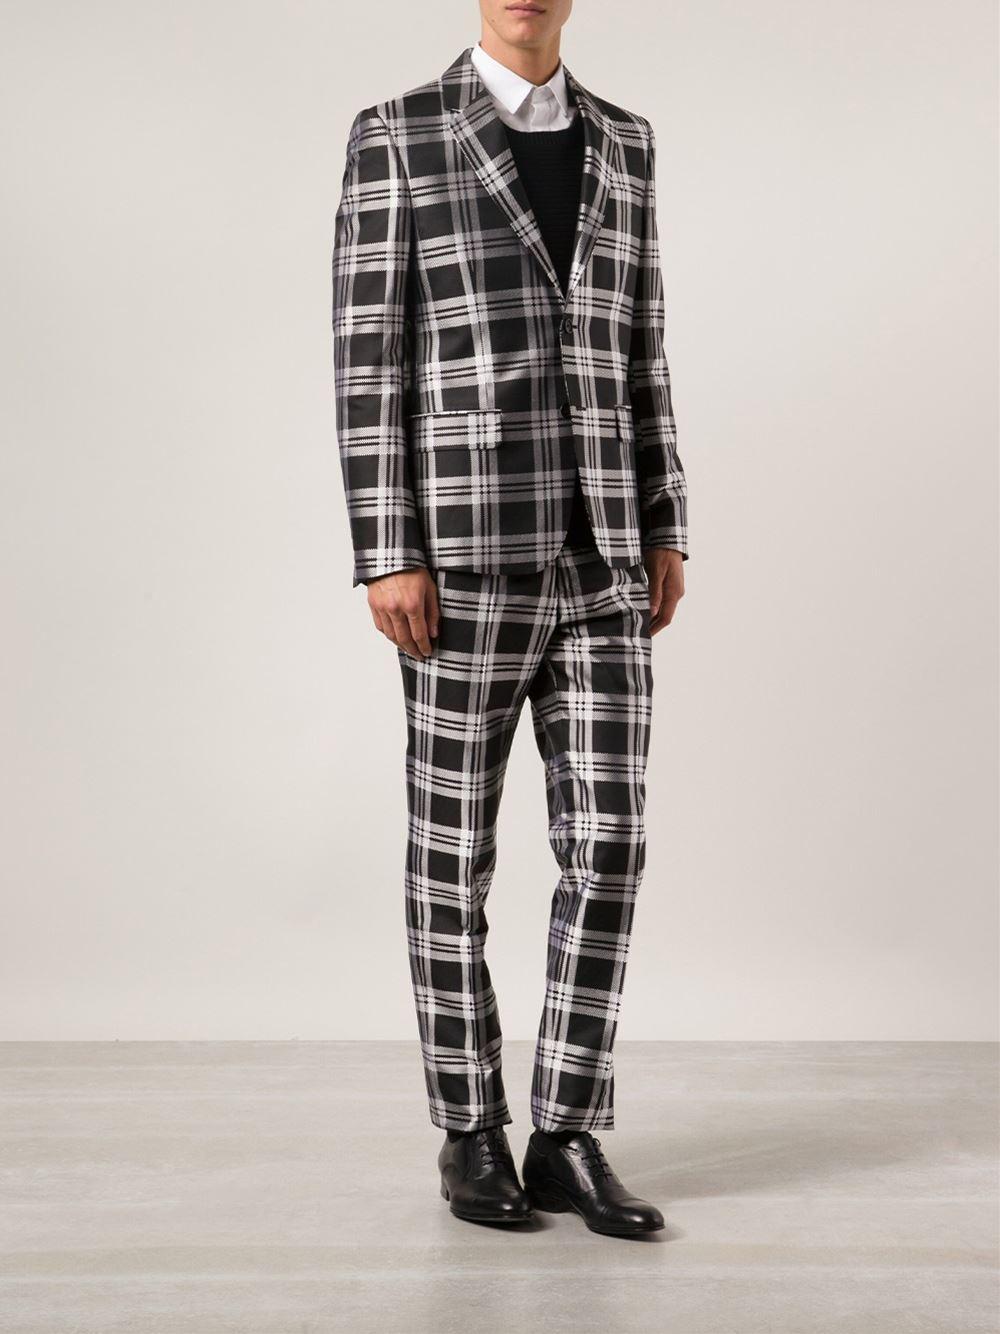 Lyst Alexander Mcqueen Plaid Suit Jacket In Black For Men